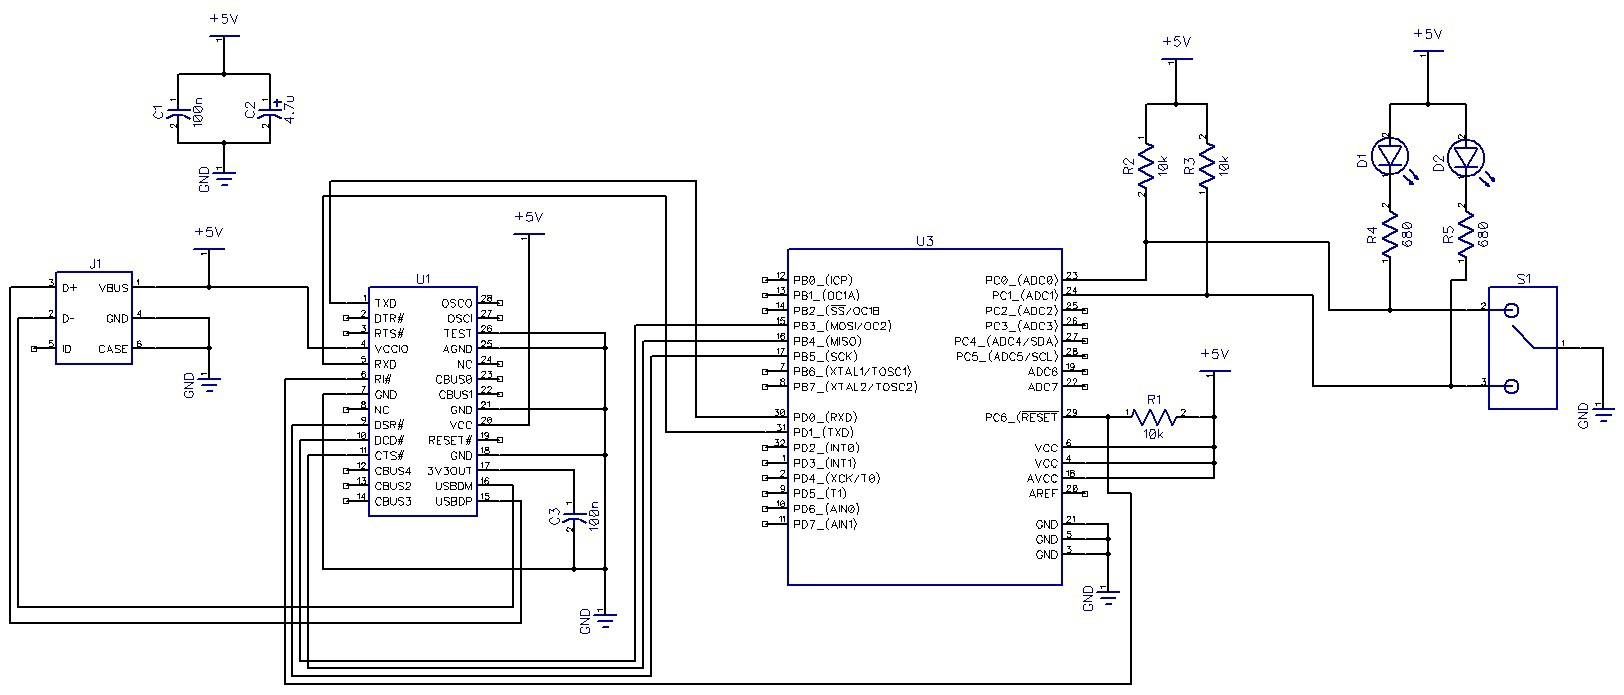 схема подключения консоли ваз 2107